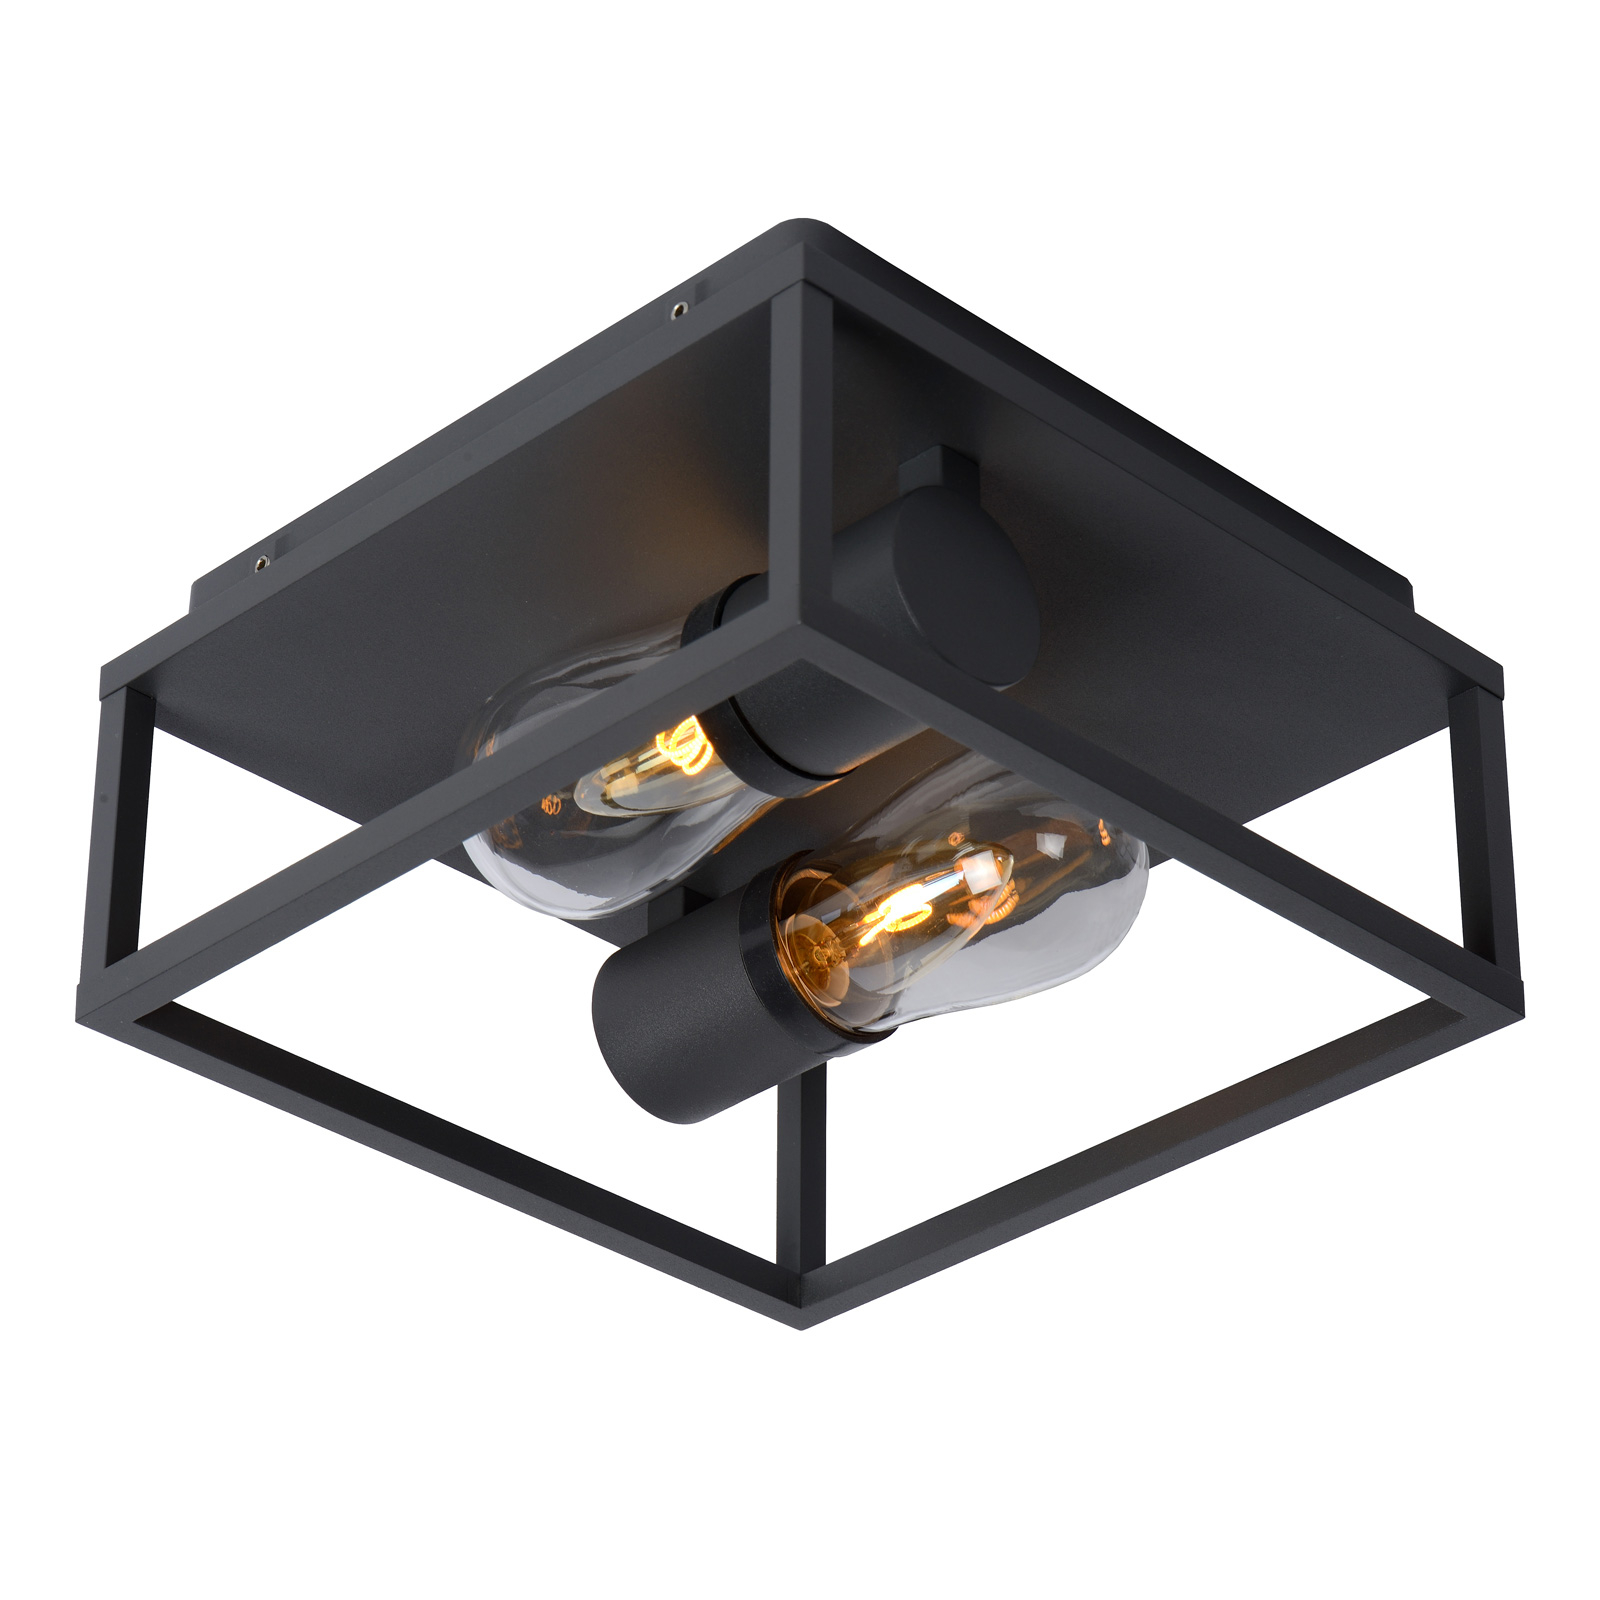 Plafondlamp Carlyn badkamer 2-lamps zwart